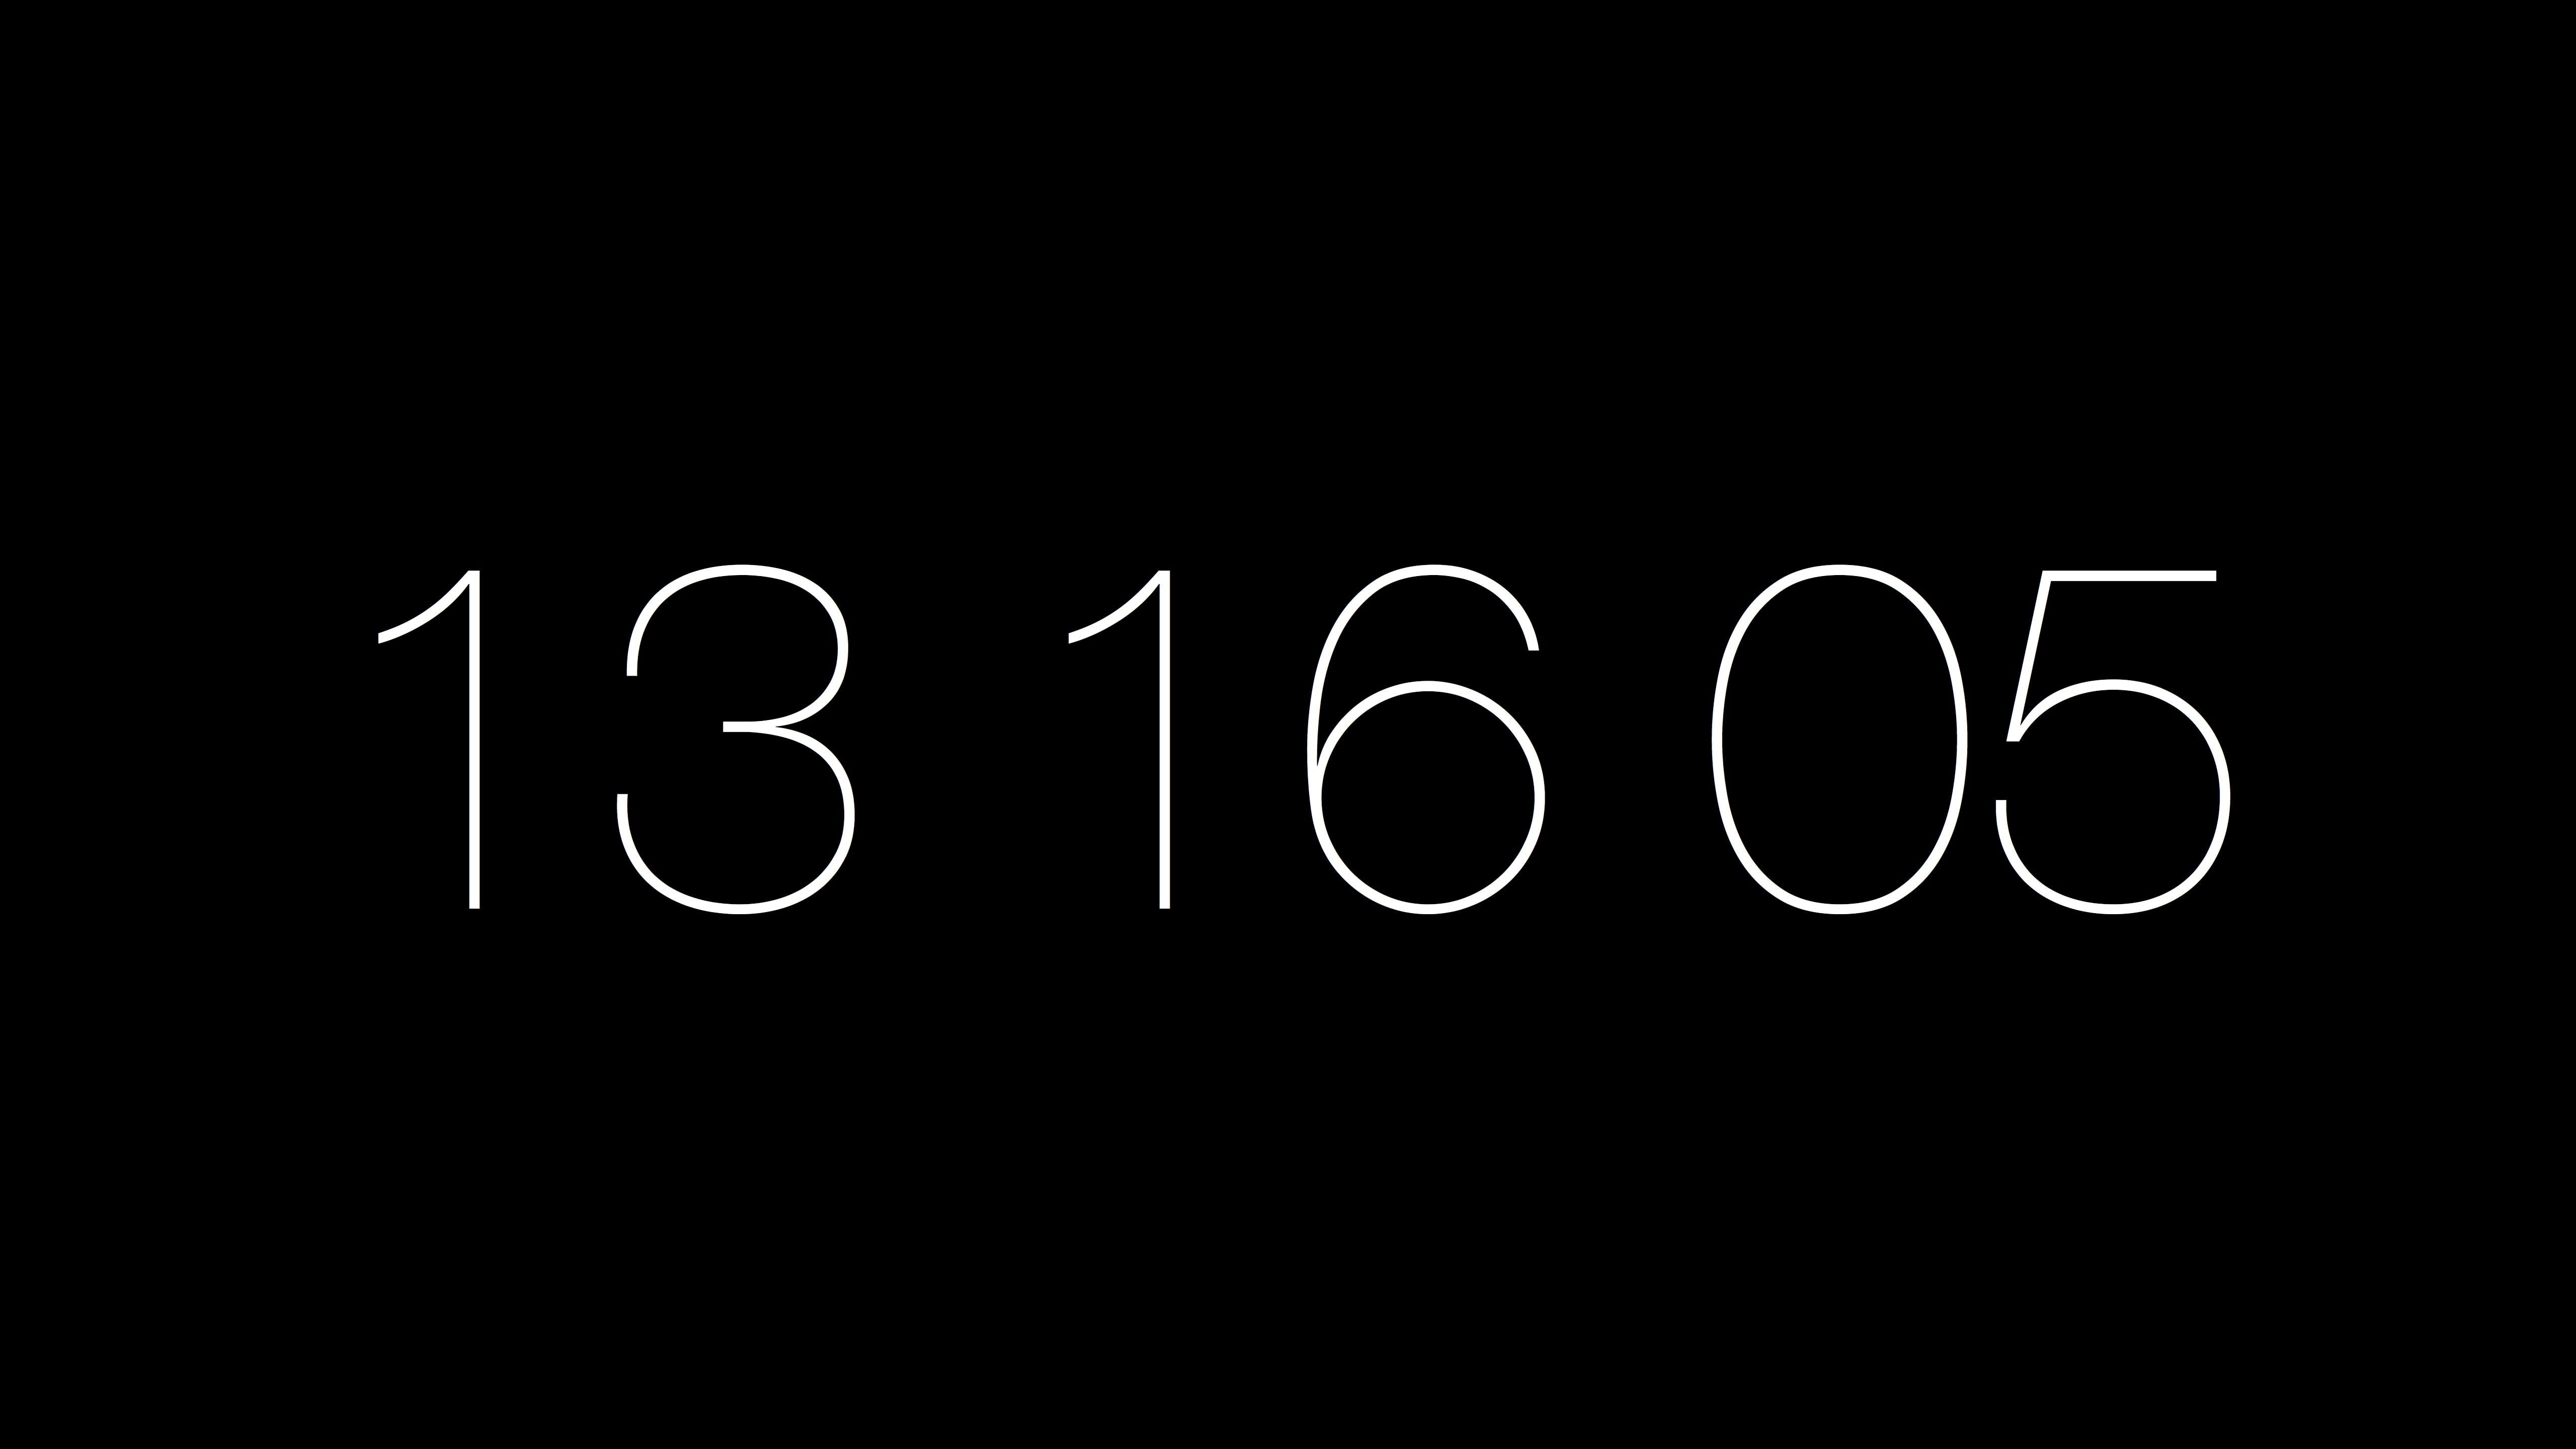 Padbury-clock-minimalist-screen-saver